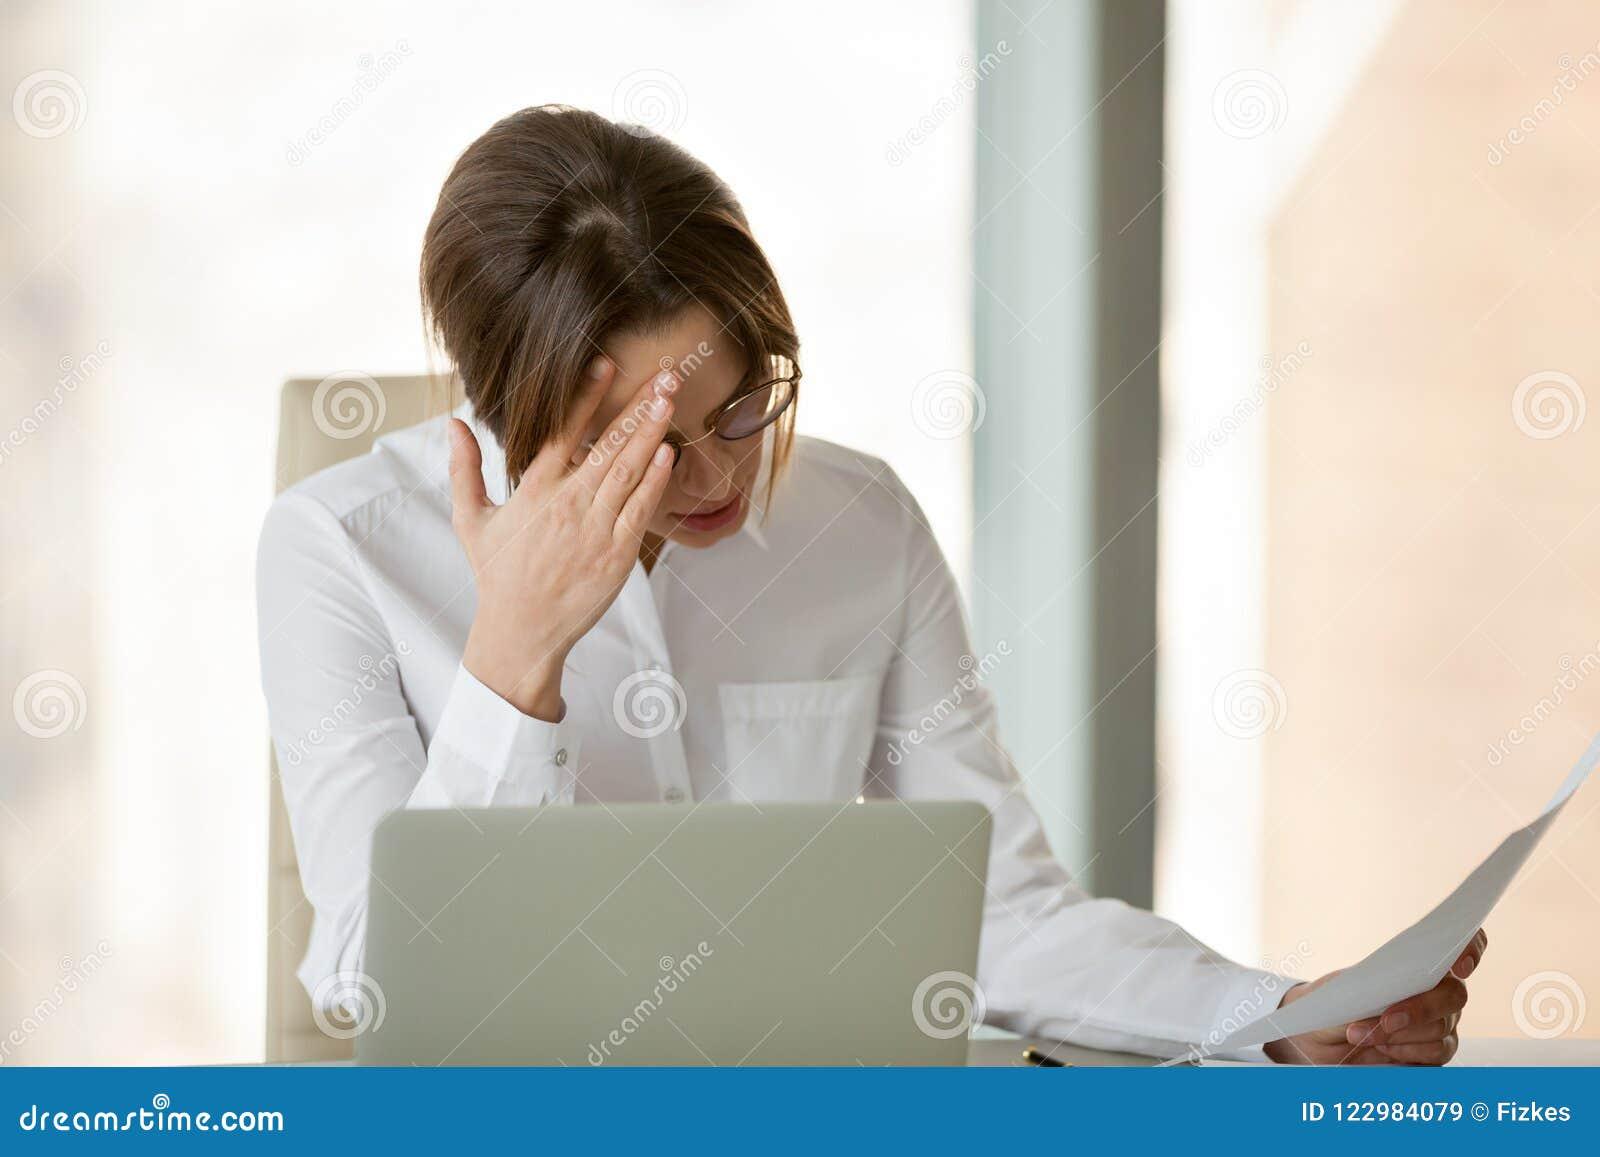 Frustrierter weiblicher Arbeitgeber enttäuscht über Firmengeschäftsfa